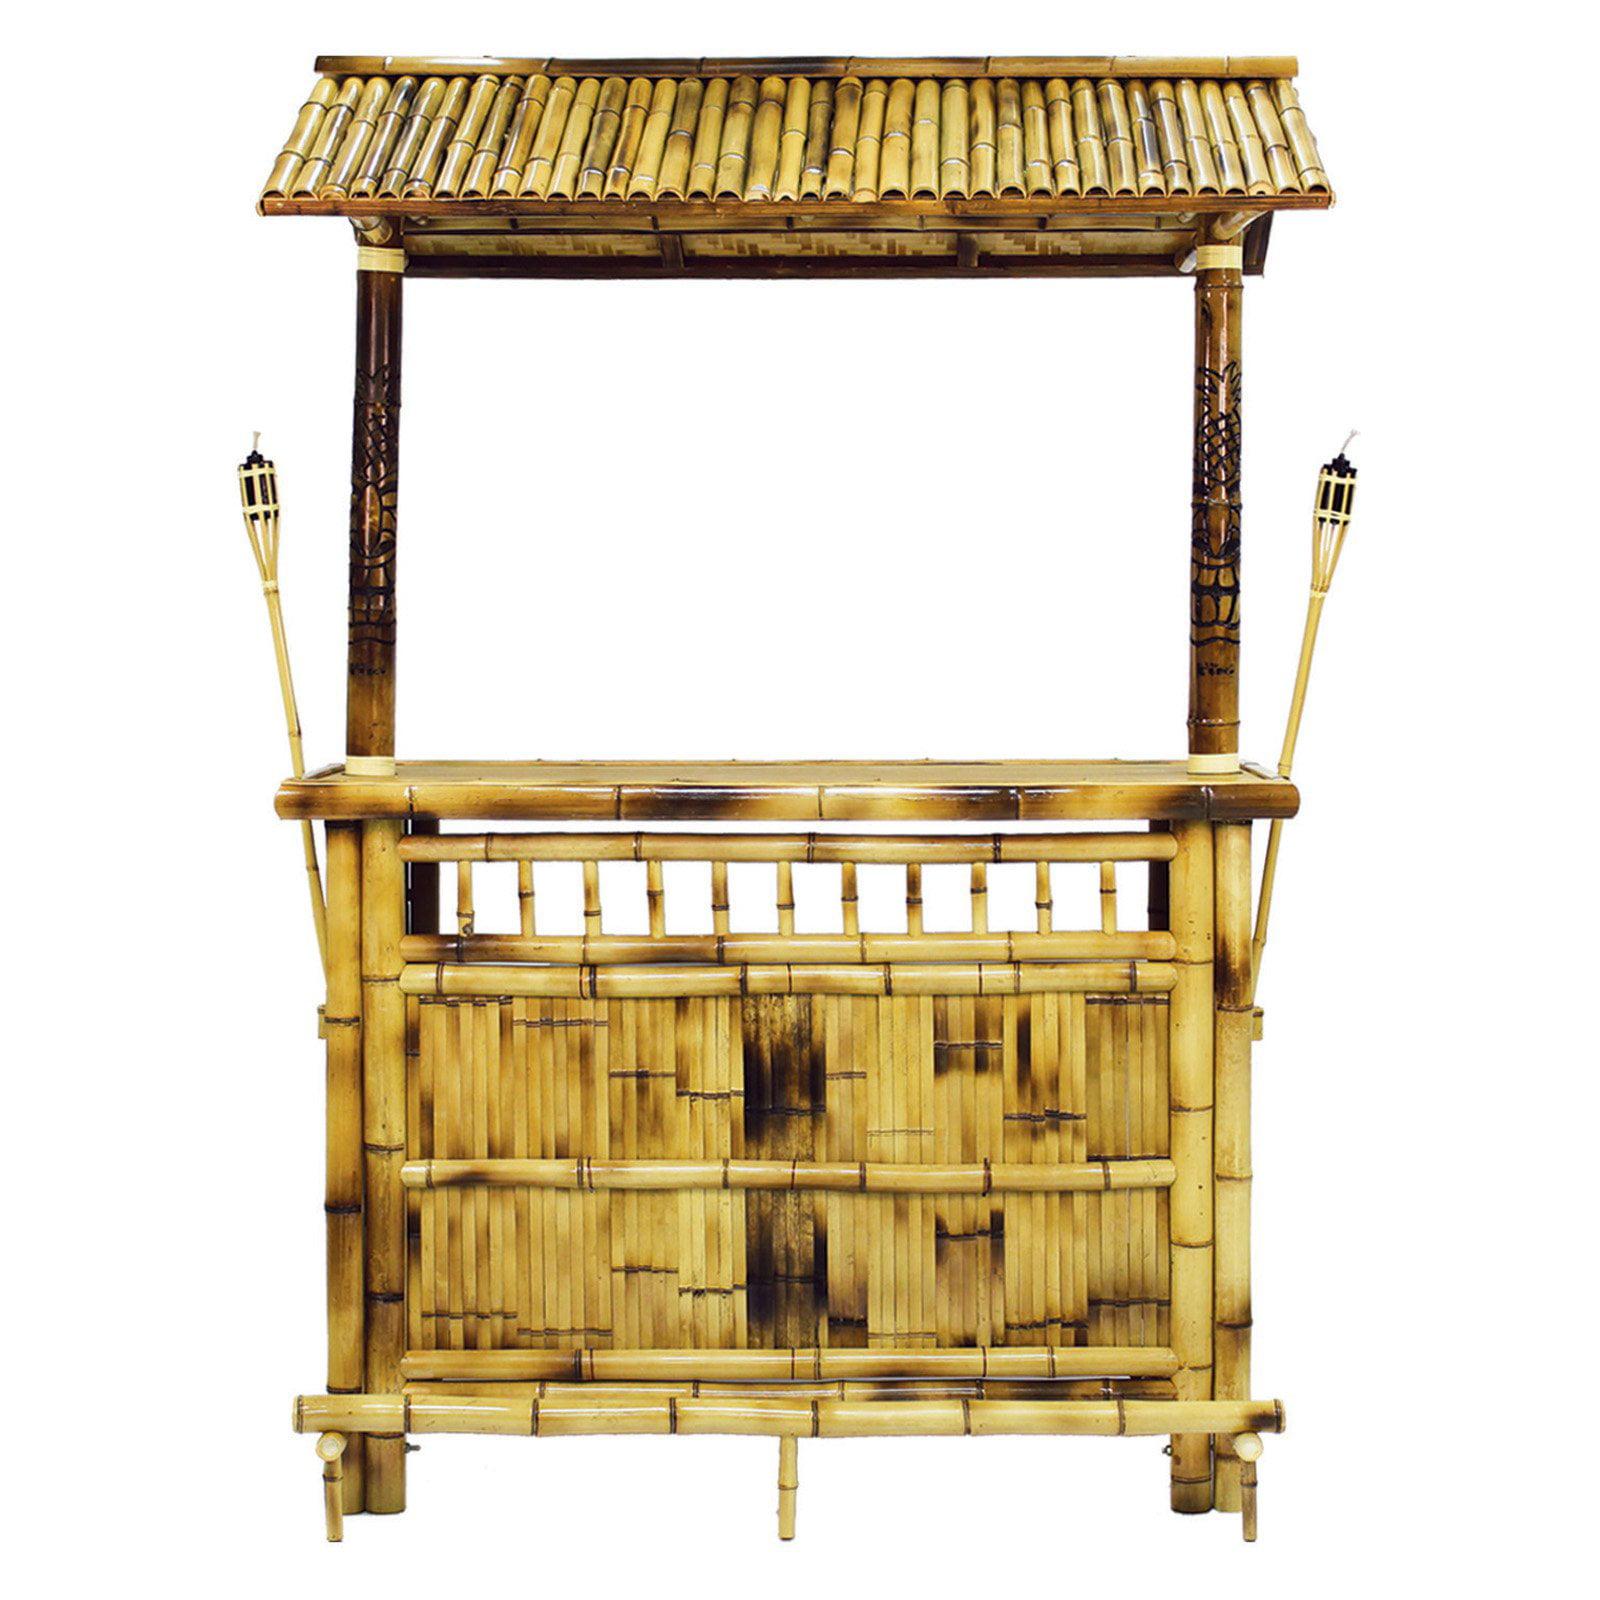 RAM Game Room Indoor/Outdoor Bamboo Tiki Bar